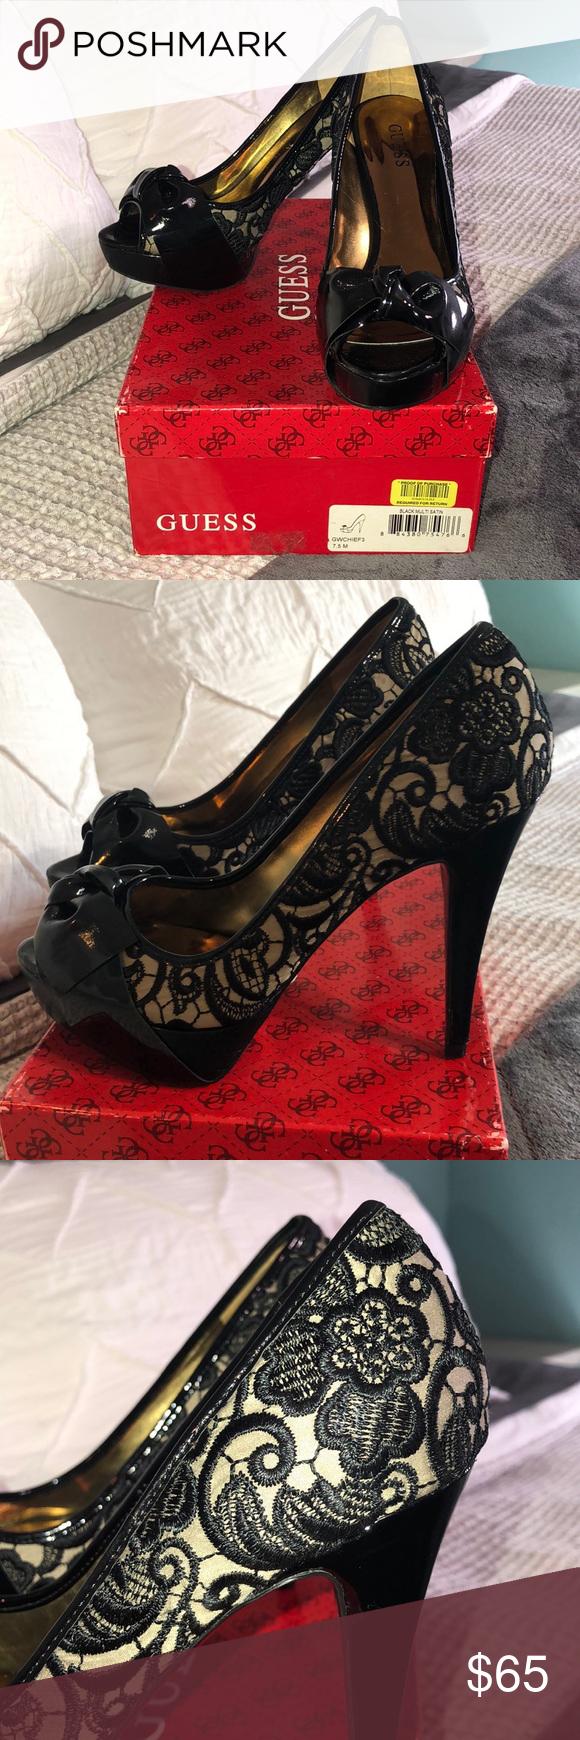 Guess Black multi satin heels size 7 12 Guess multi satin heels peep toe Worn   Guess Black multi satin heels size 7 12 Guess multi satin heels peep toe Worn